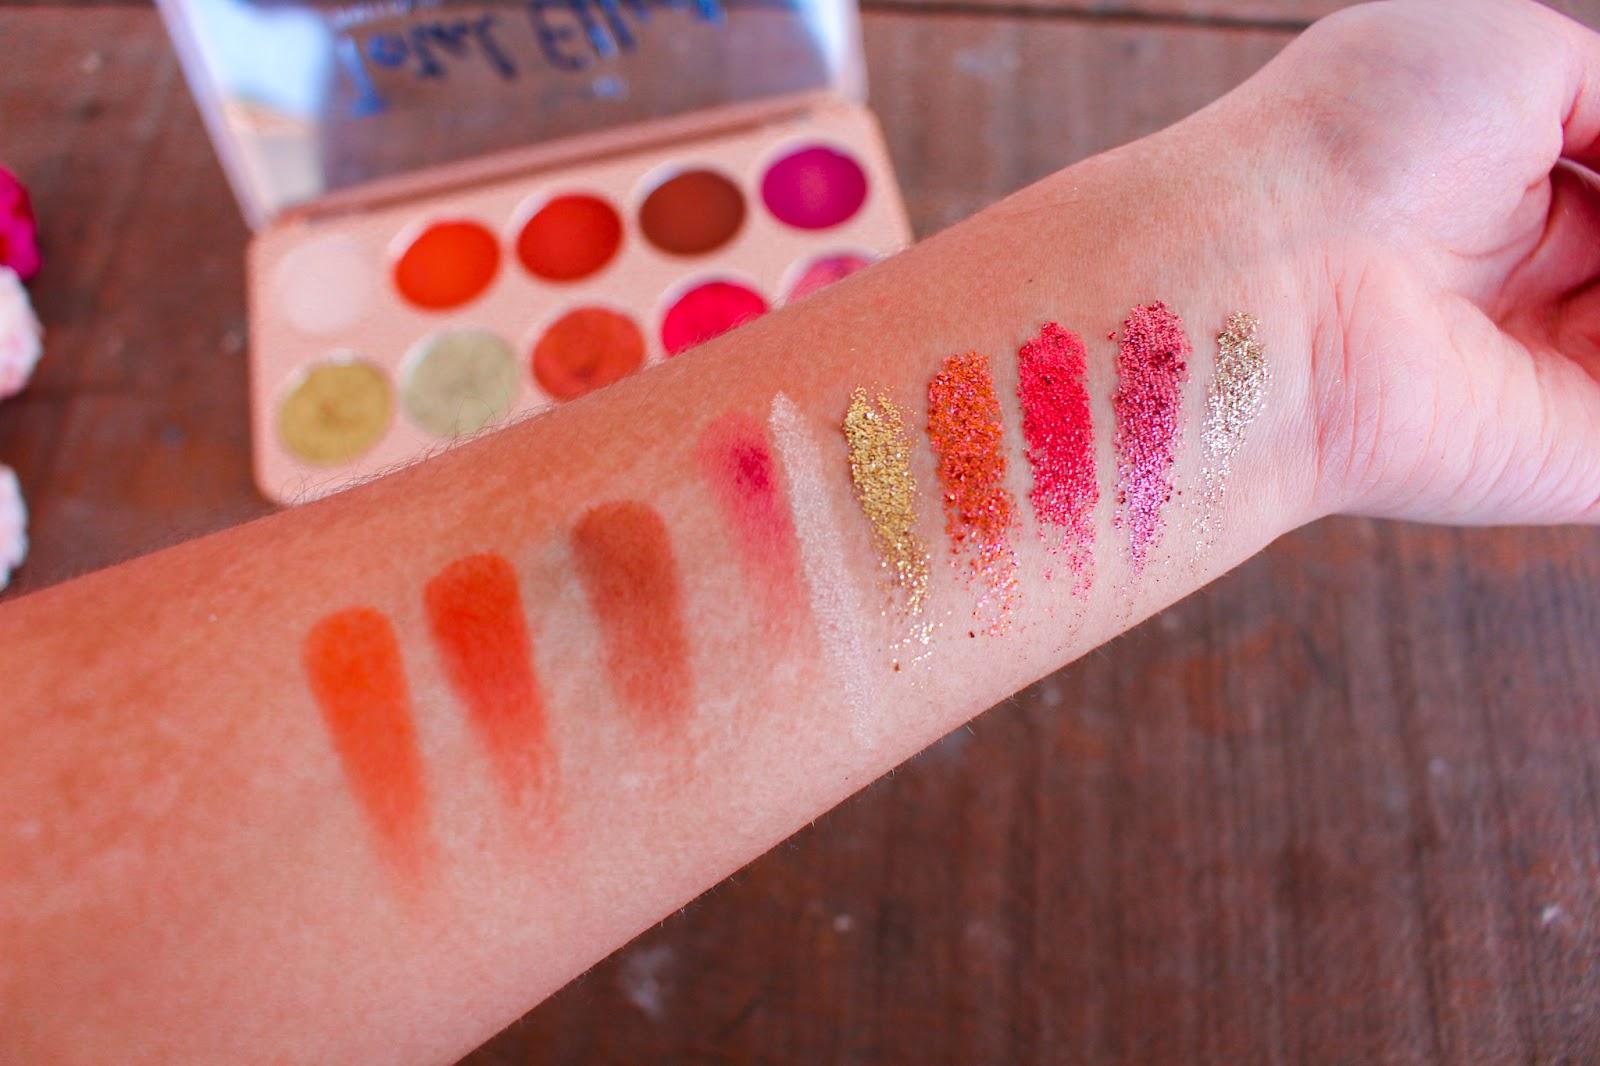 Resenha: Paletas de Sombras Glitz Glam Total Effect - Belle Angel